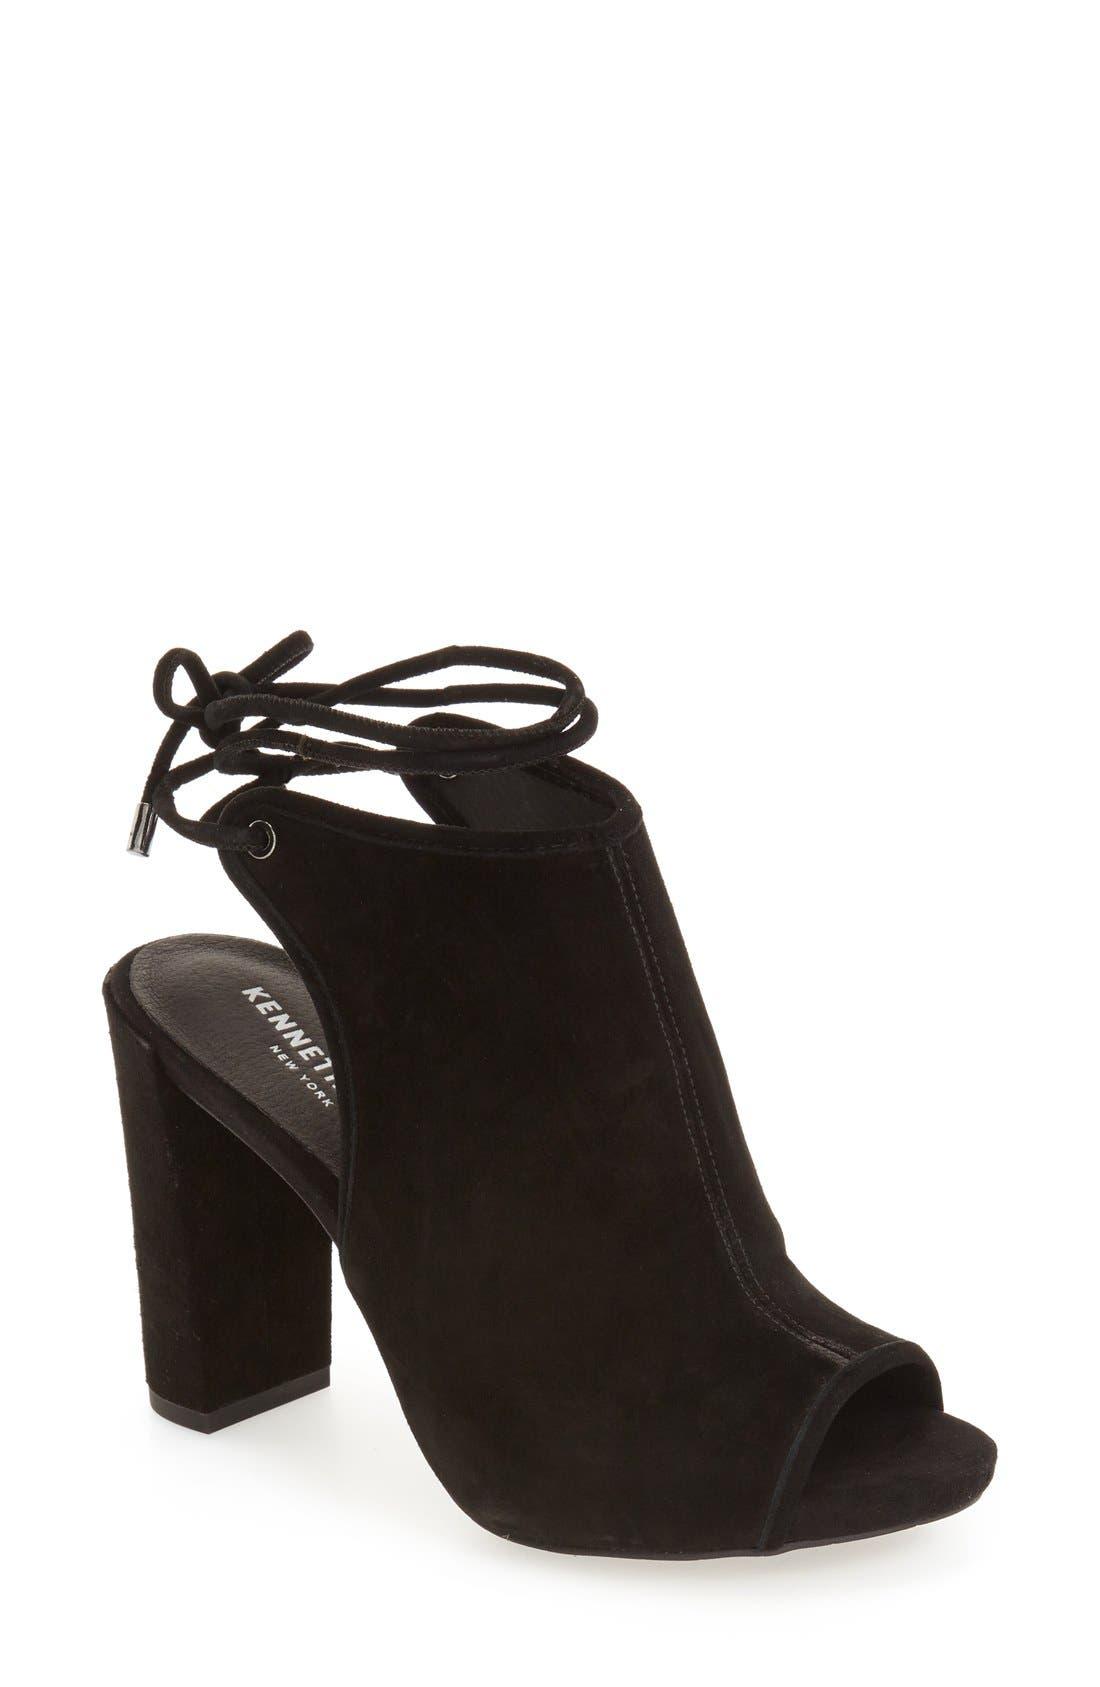 Darla Block Heel Sandal,                             Main thumbnail 1, color,                             001